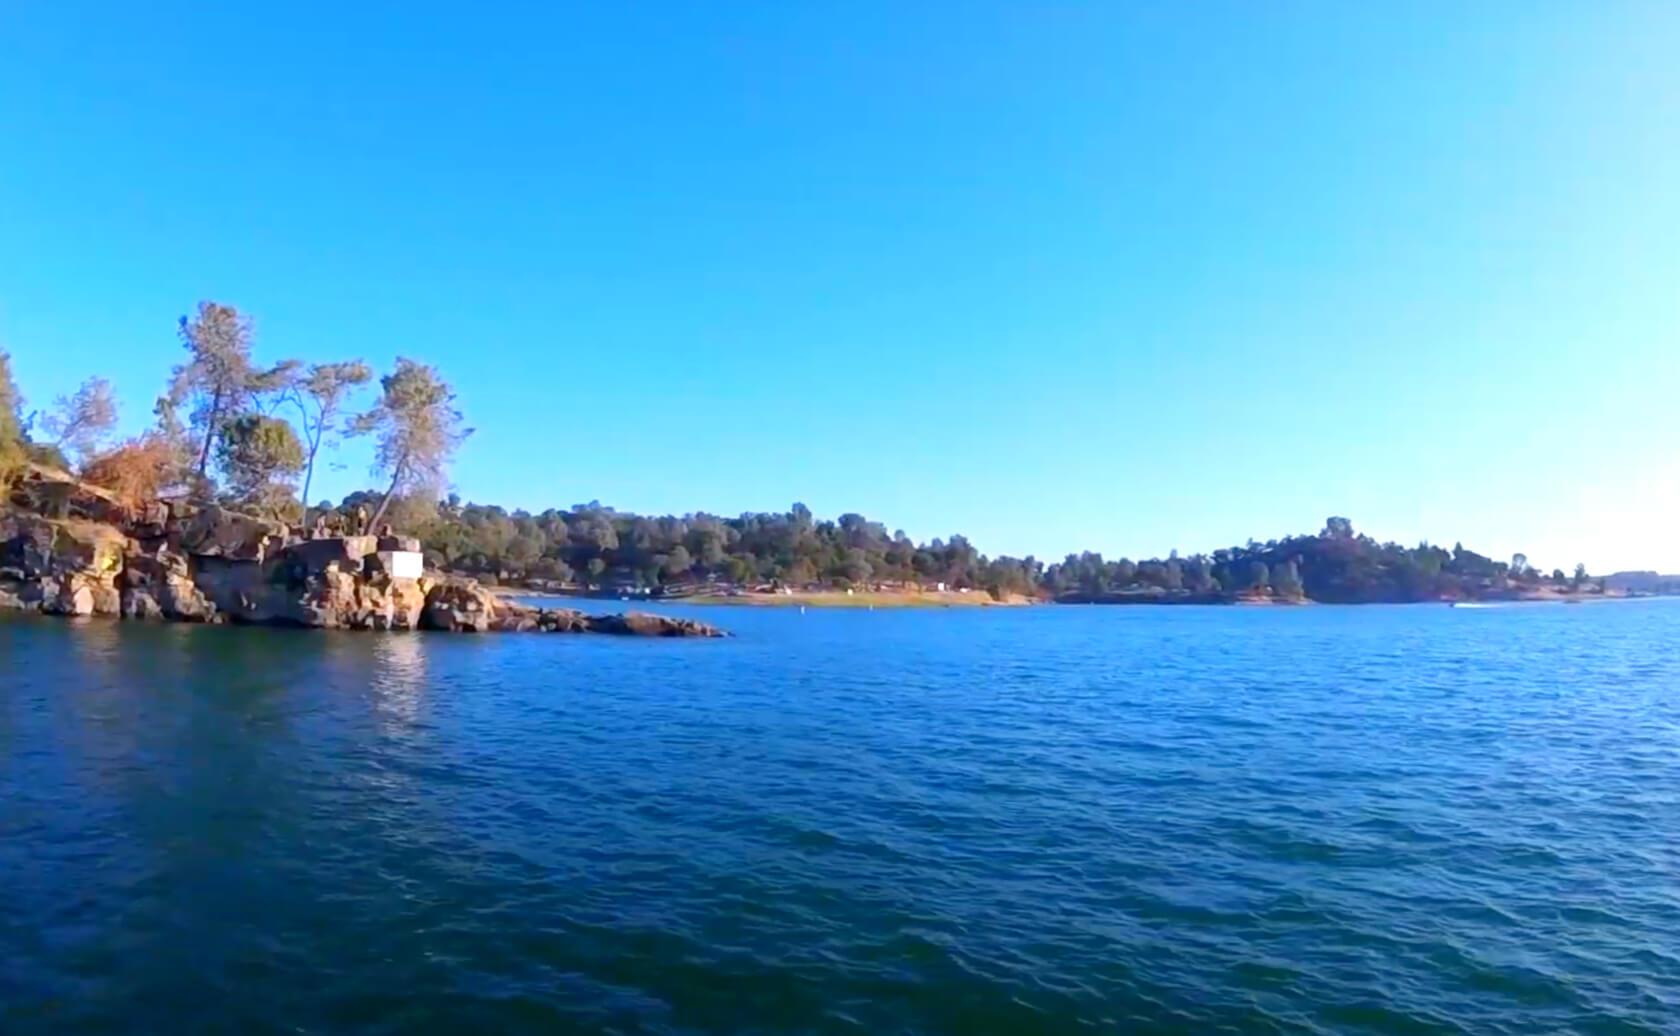 Camanche-Lake-Reservoir-Fishing-Guide-Report-California-08